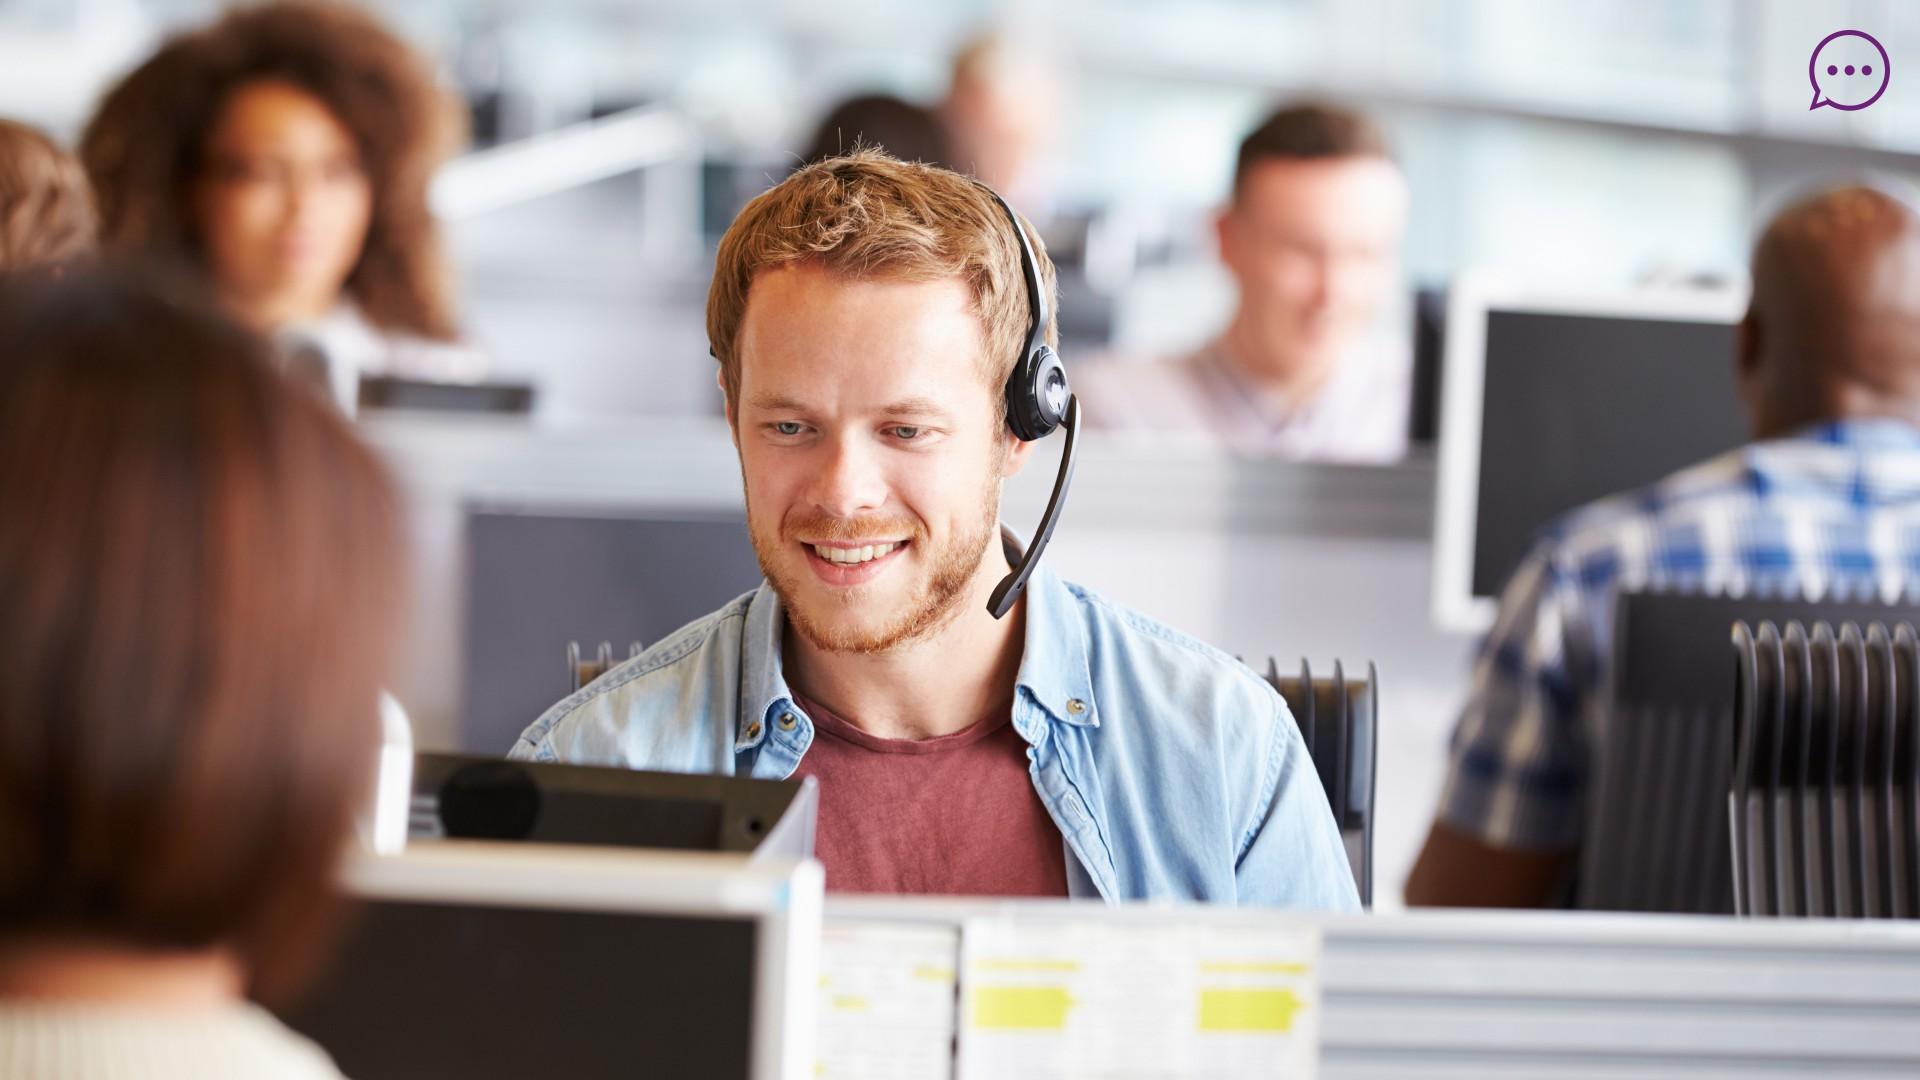 Sistema_de_telefonia_VoIP_entenda_como_essa_tecnologia_funciona